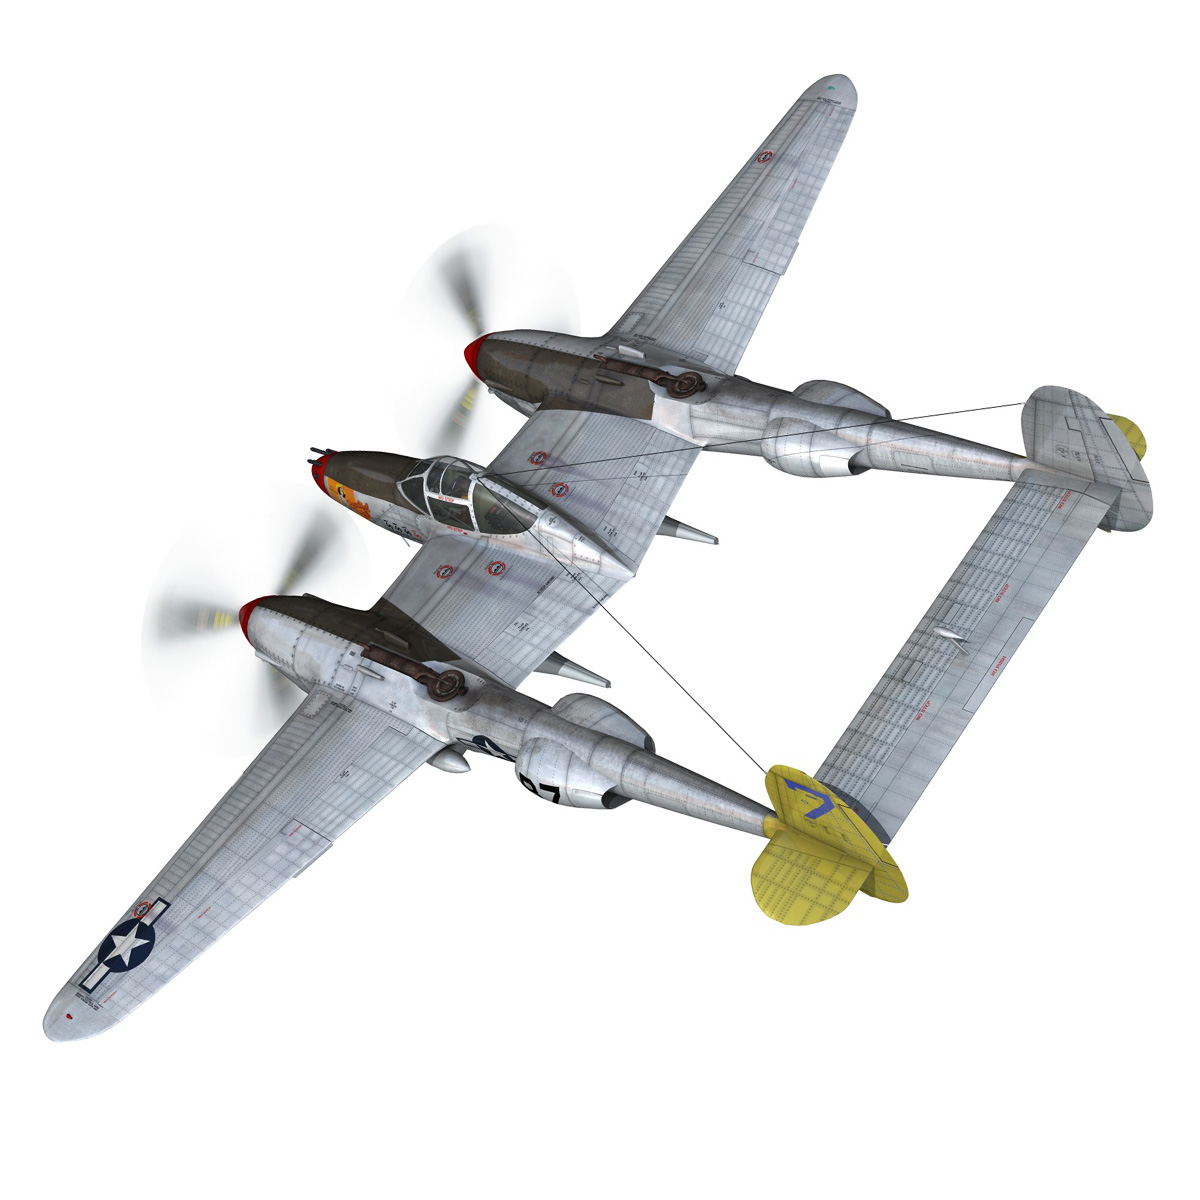 lockheed p-38 lightning – beautiful bitch 3d model fbx c4d lwo obj 272668